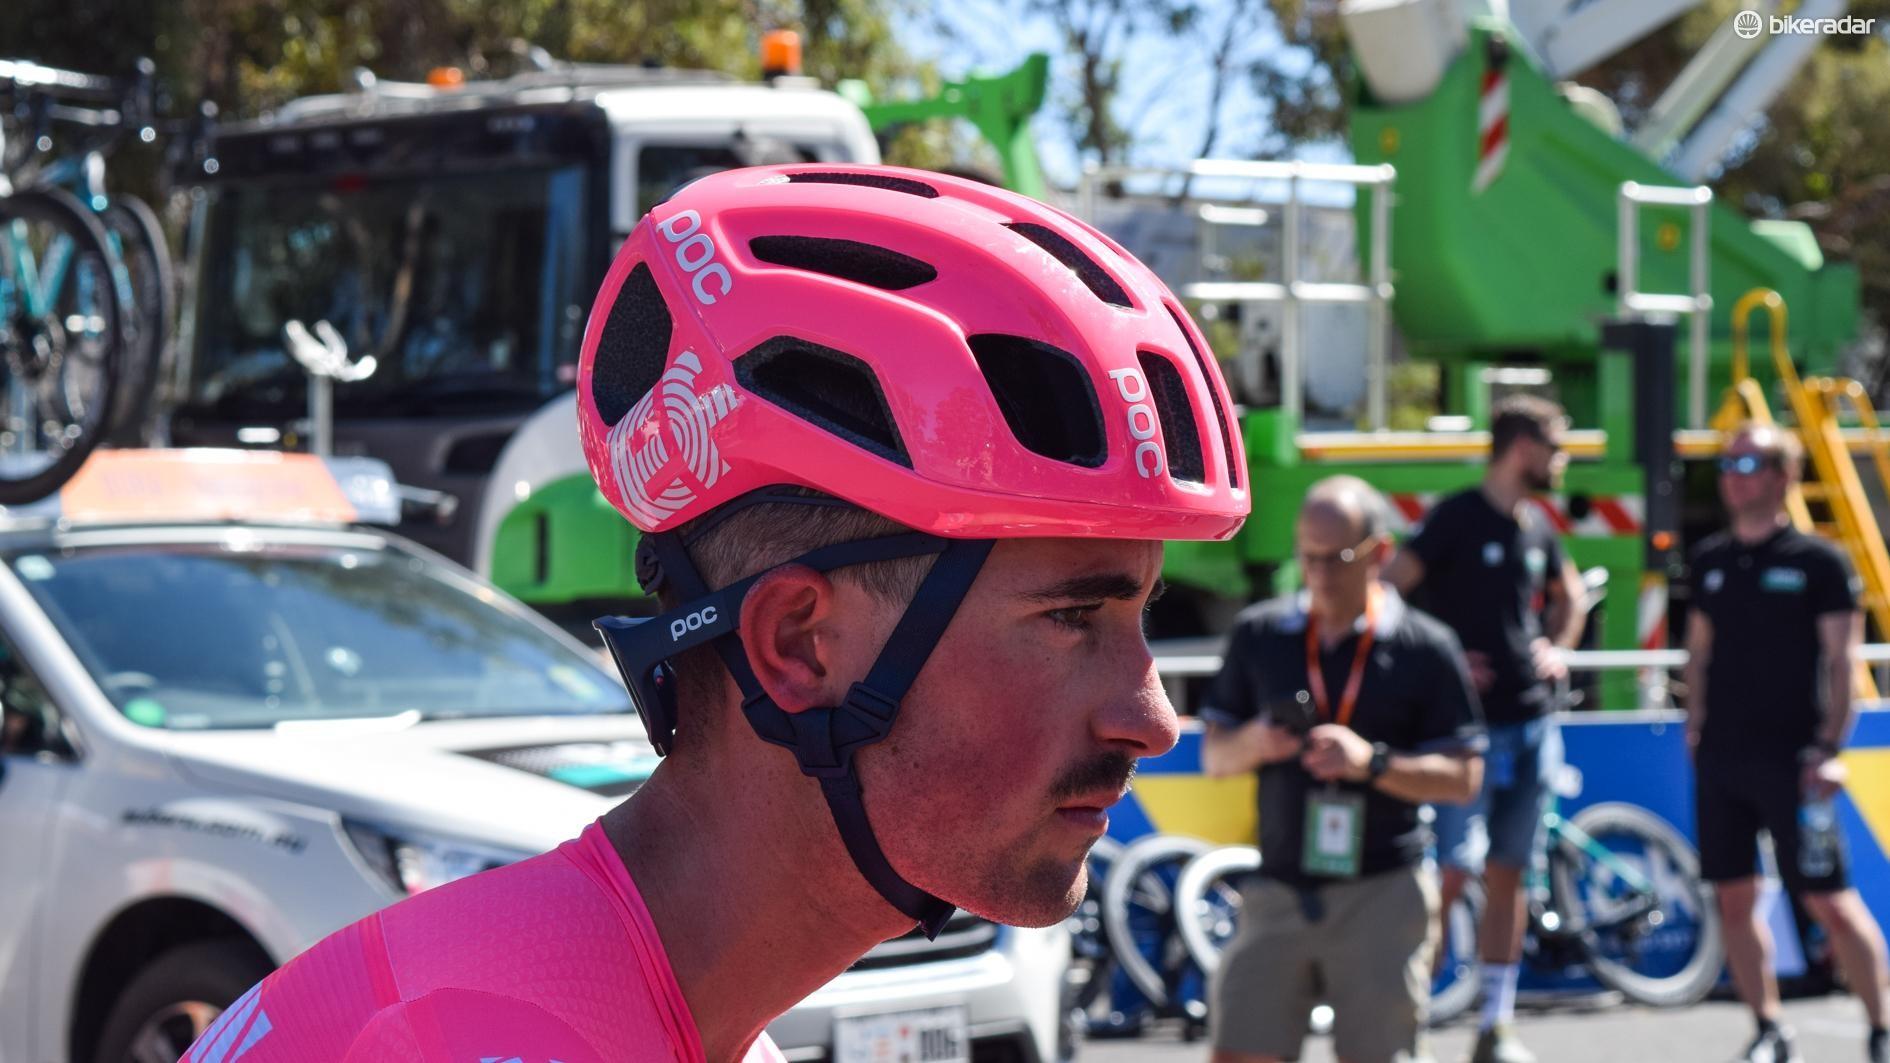 POC also provides the WorldTour team with eyewear